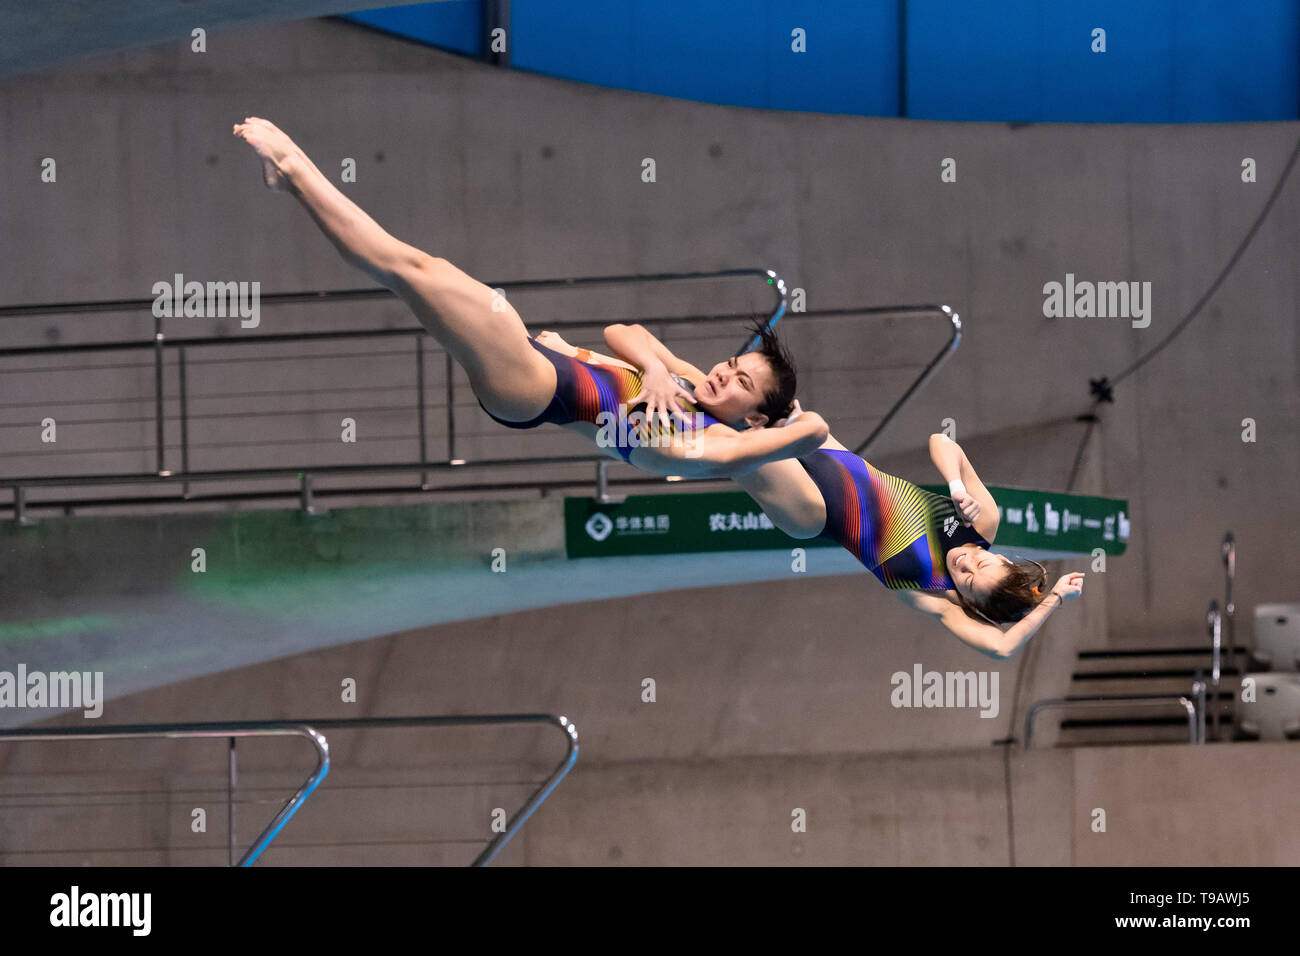 London, UK. 17th May, 2019. Yan Yee Ng and Nur Dhabitah Binti Sabri (MAS) compete in Women's 3m Synchro Springboard Final during FINA/CNSG Diving World Series Final at London Aquatics Centre on Friday, 17 May 2019. London England.  Credit: Taka G Wu/Alamy Live News Stock Photo